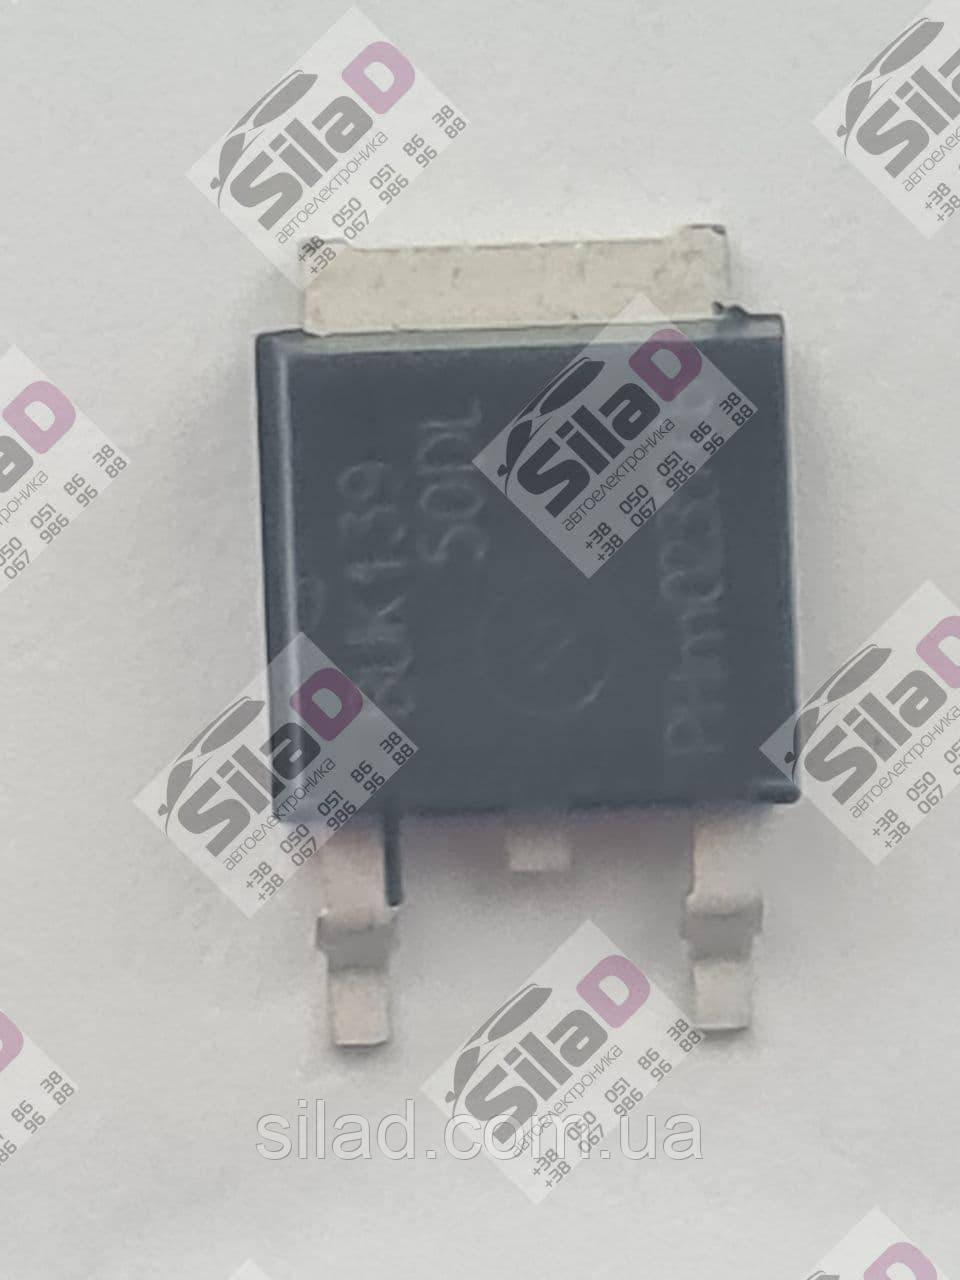 Транзистор BUK139-50DL NXP Semiconductors корпус DPAK